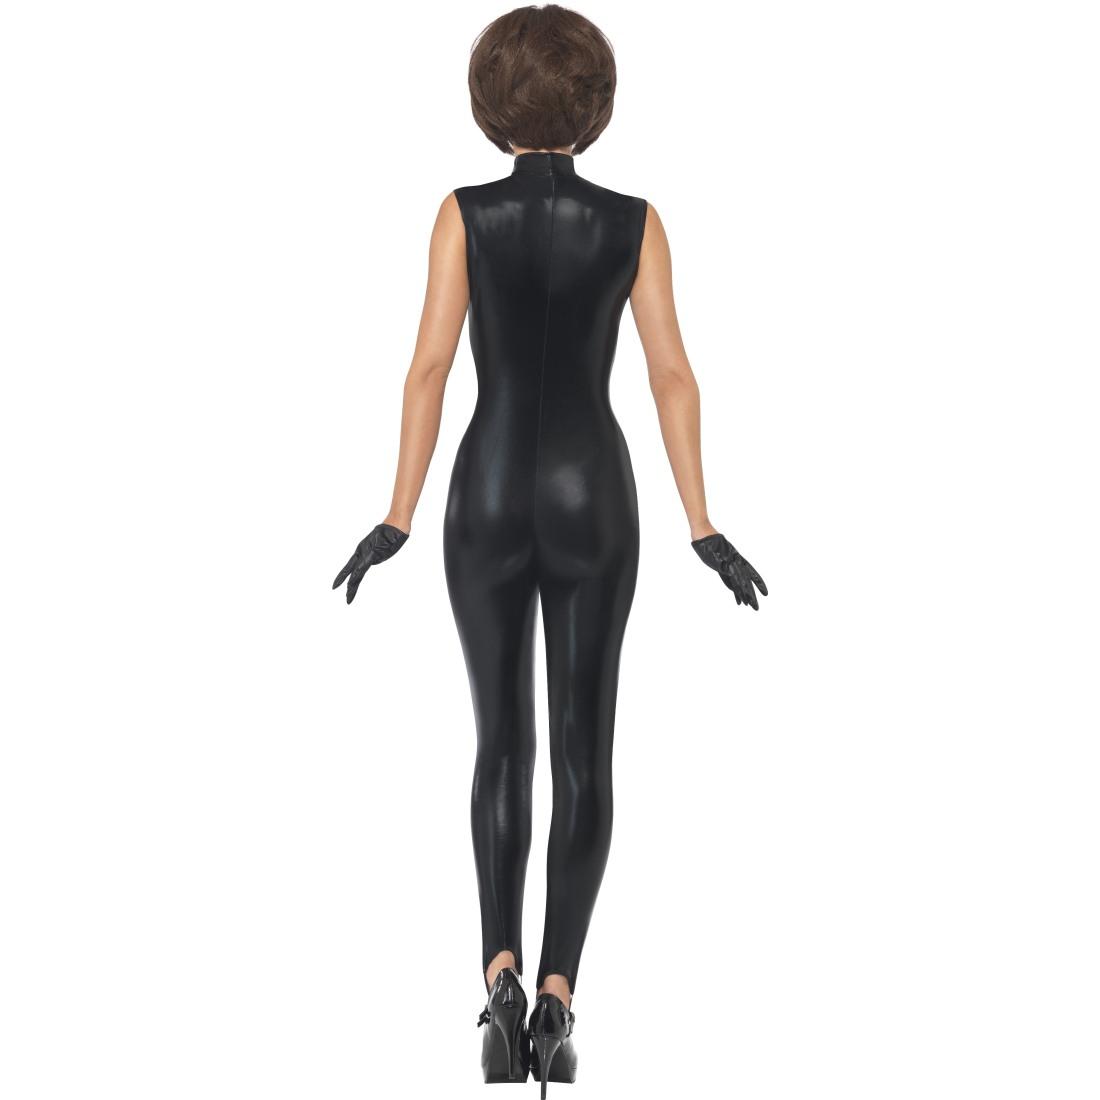 90er jumpsuit posh girlband spice girls kost m ganzk rperkost m popstar outfit ebay. Black Bedroom Furniture Sets. Home Design Ideas